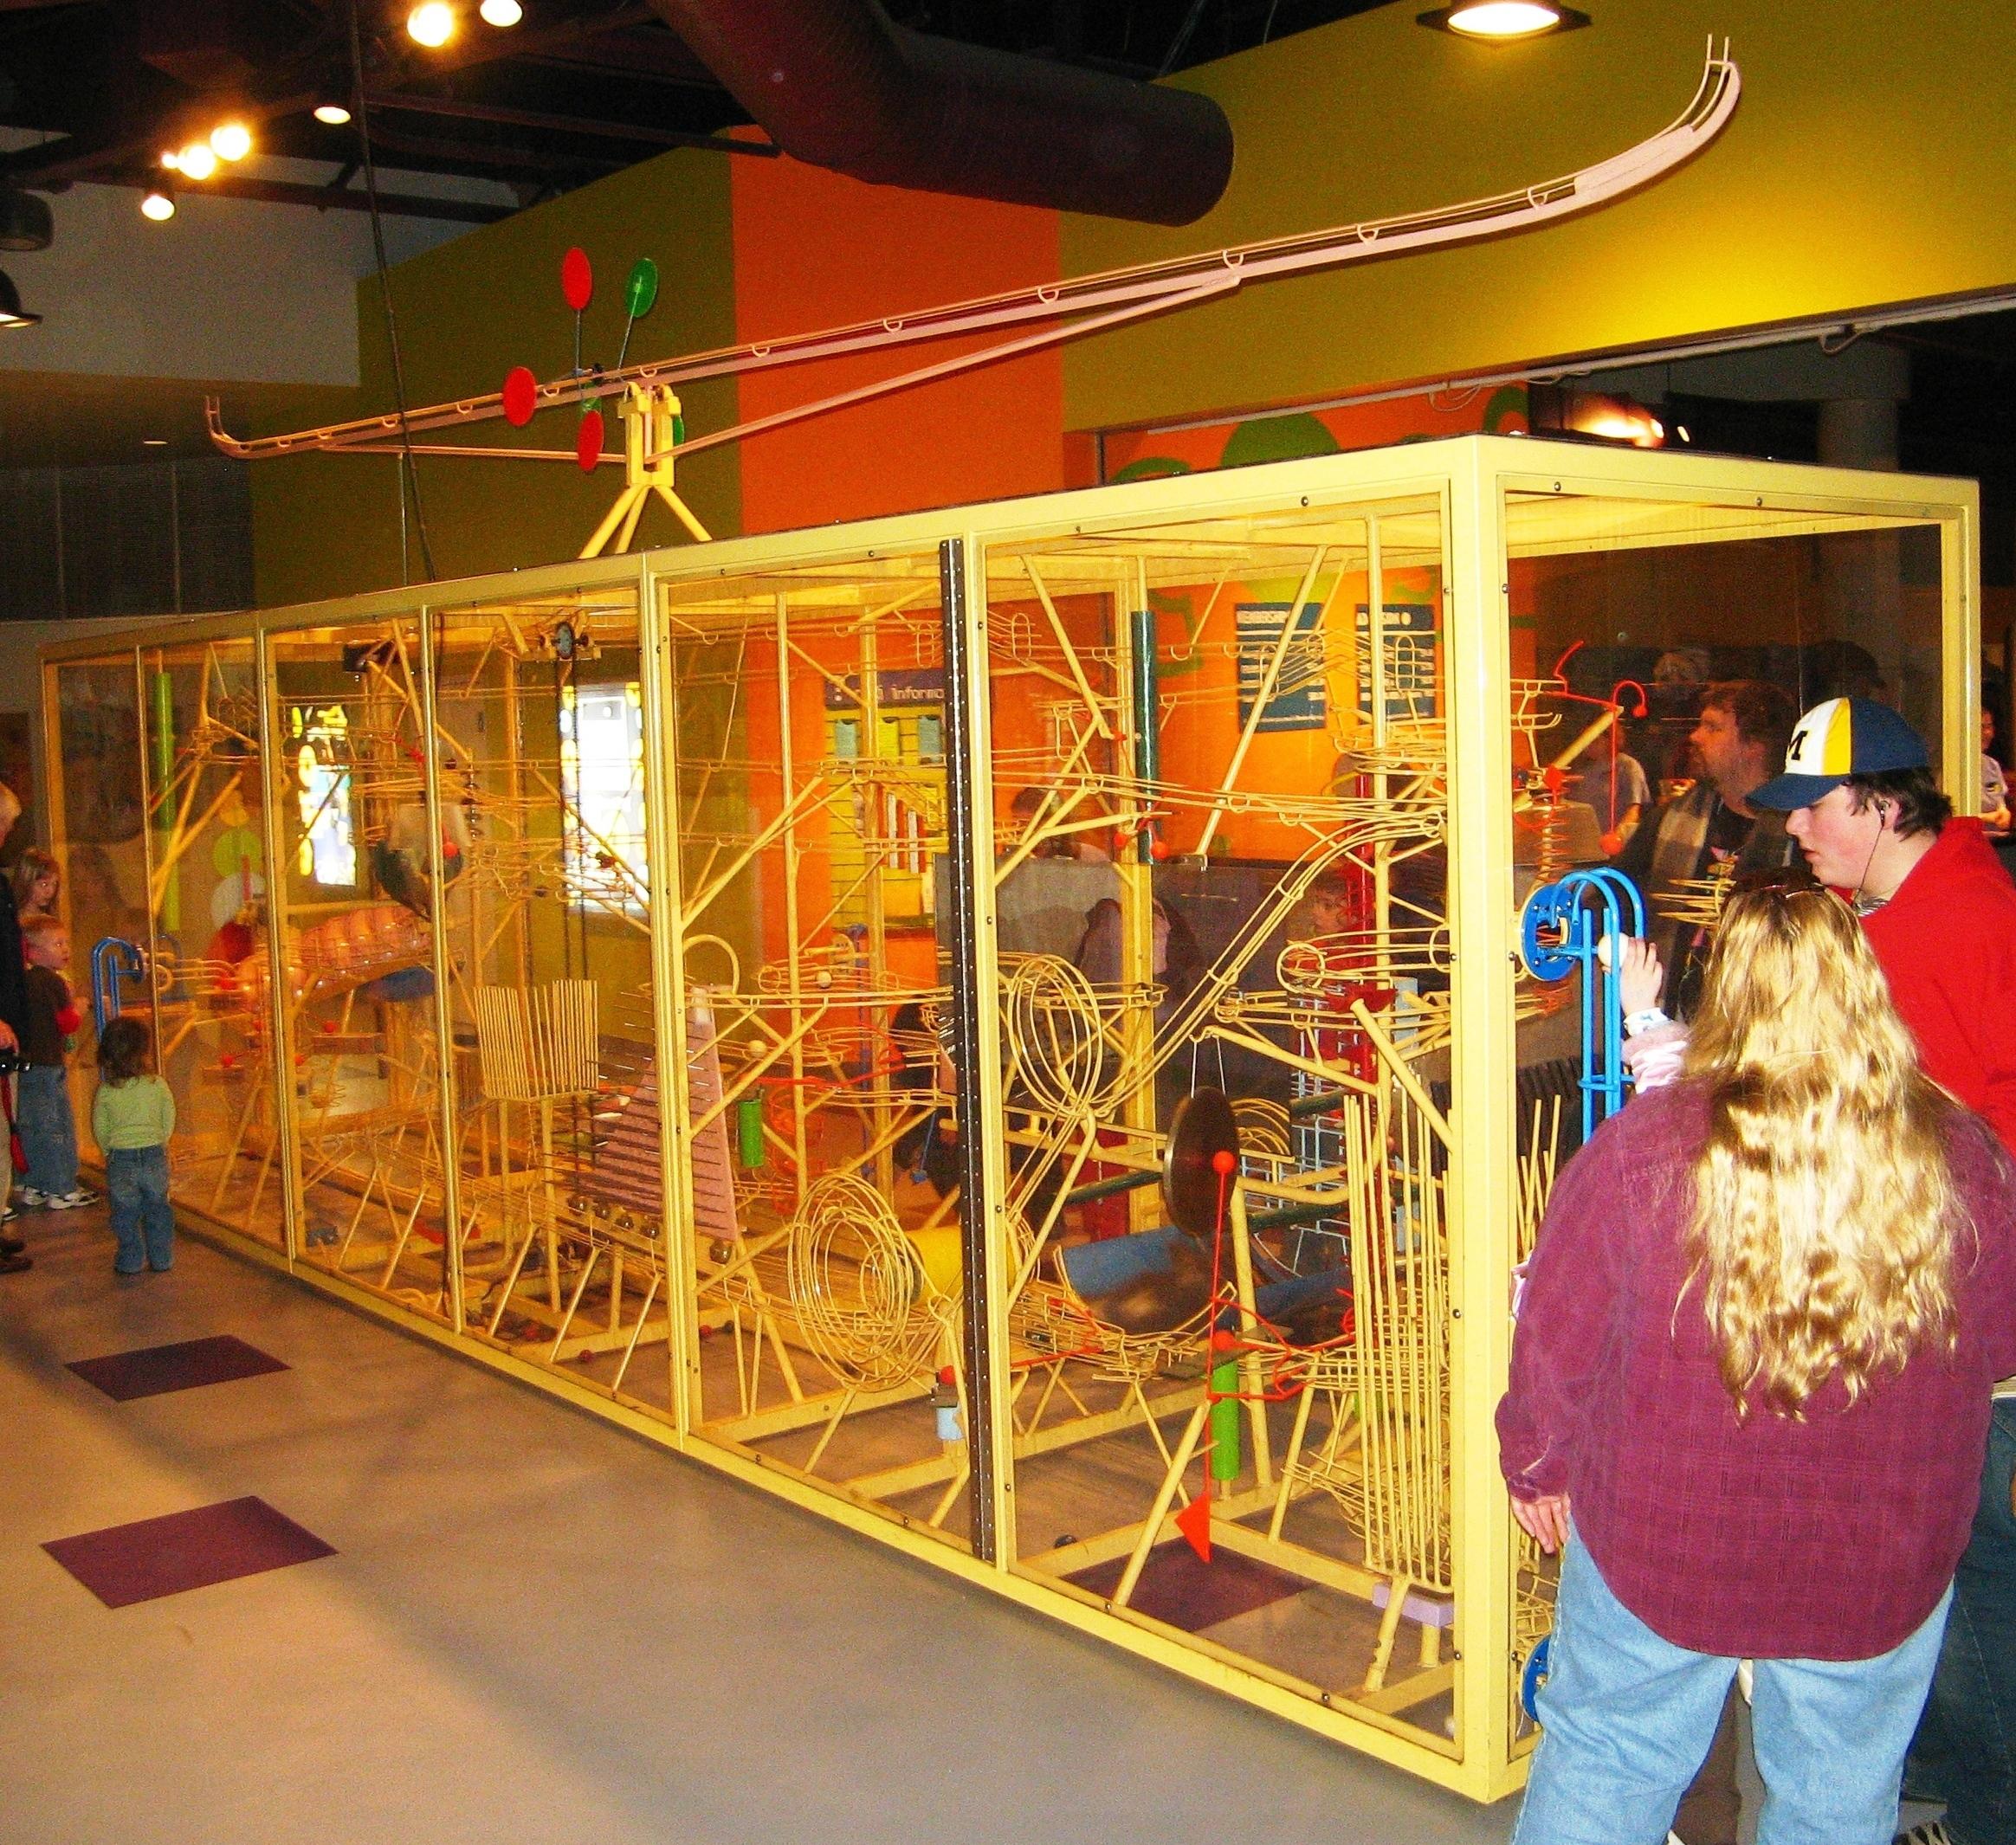 File:Rube Goldbergian music machine at COSI Toledo.JPG - Wikimedia ...